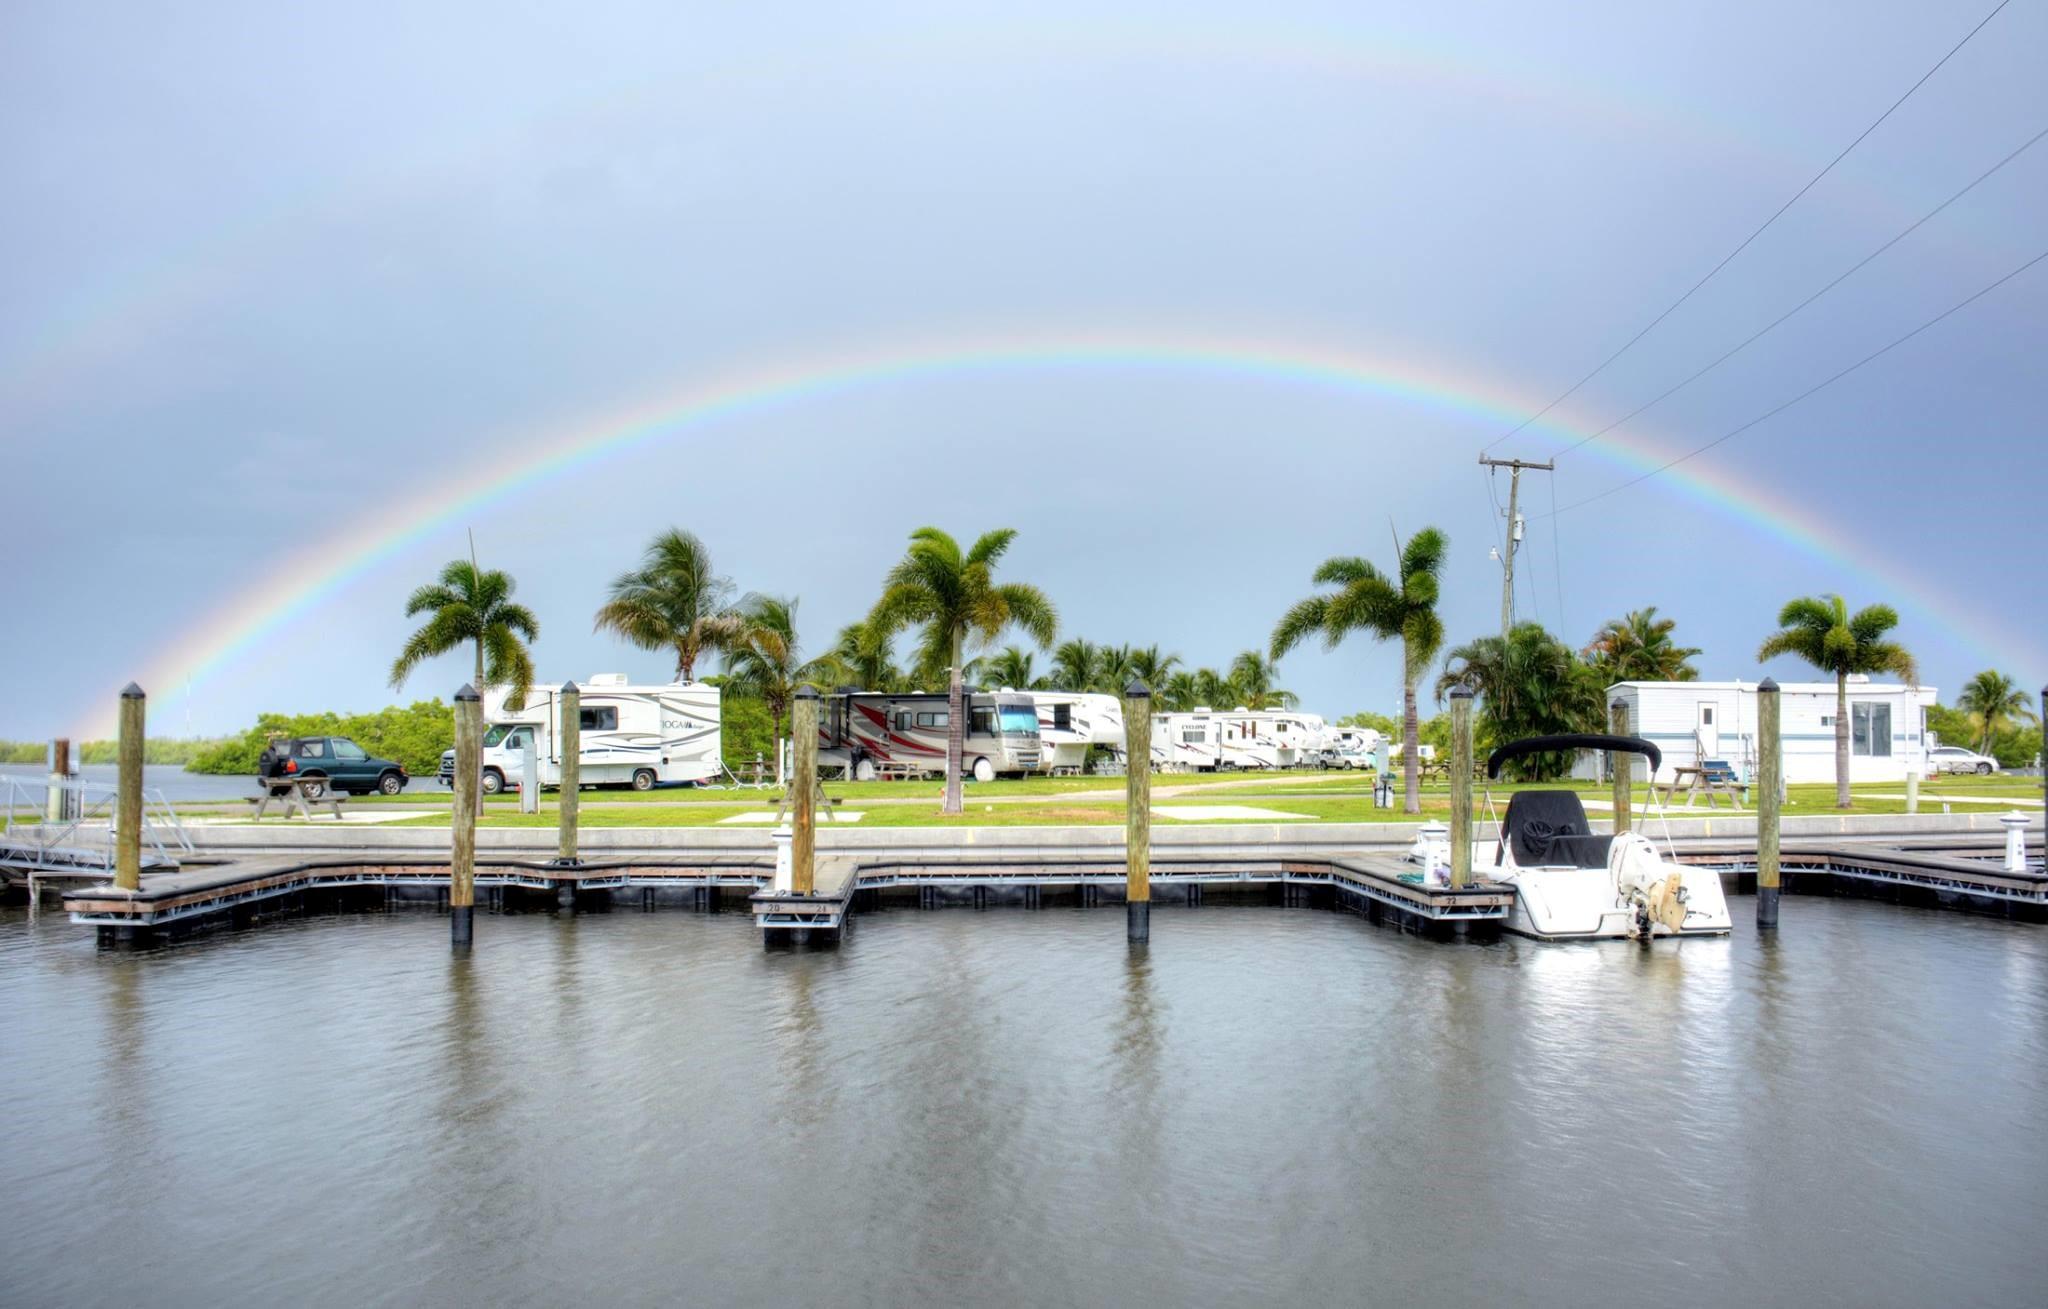 San Carlos RV Resort and Marina with Rainbow